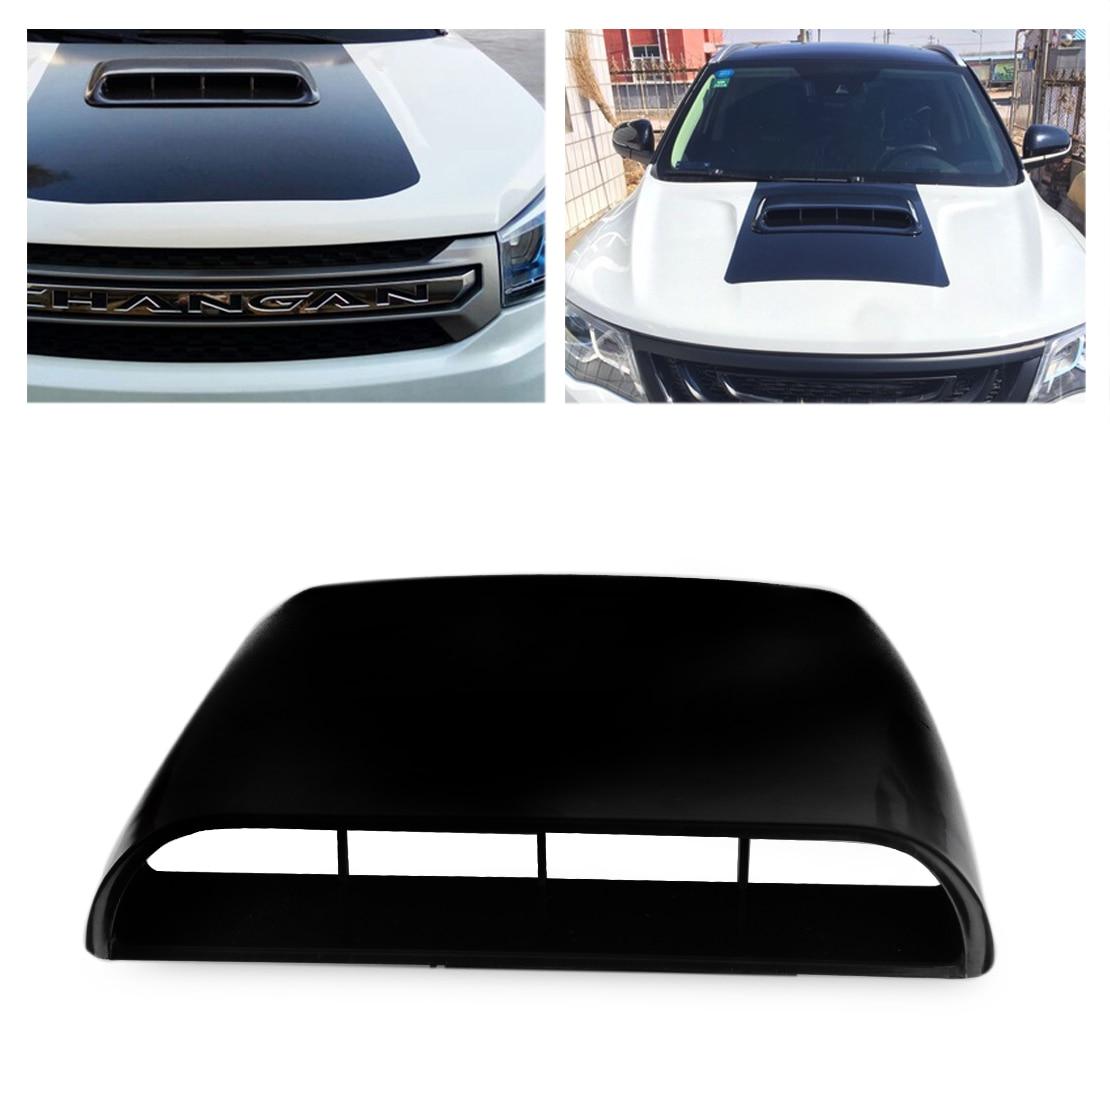 Universal Car Decorative Air Flow Intake Hood Scoop Bonnet Vent Sticker Cover Hood White